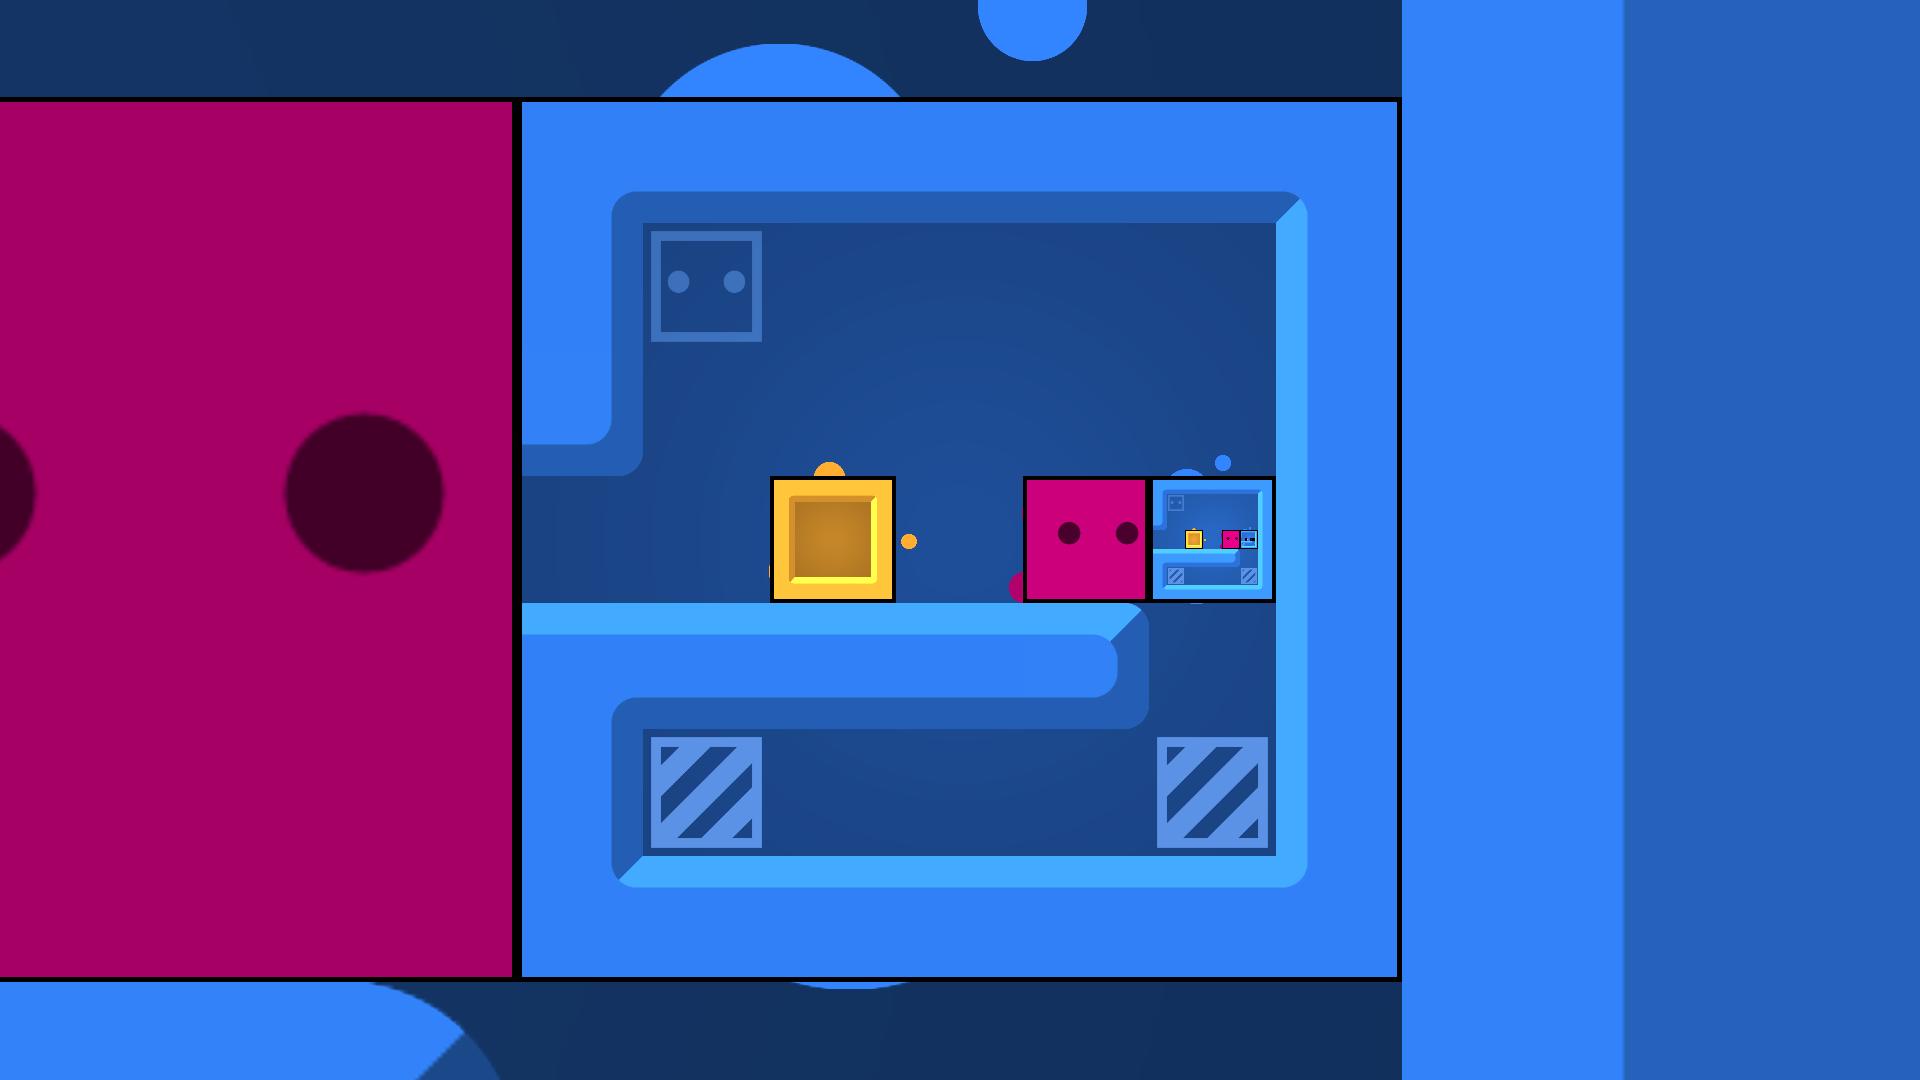 parabox2